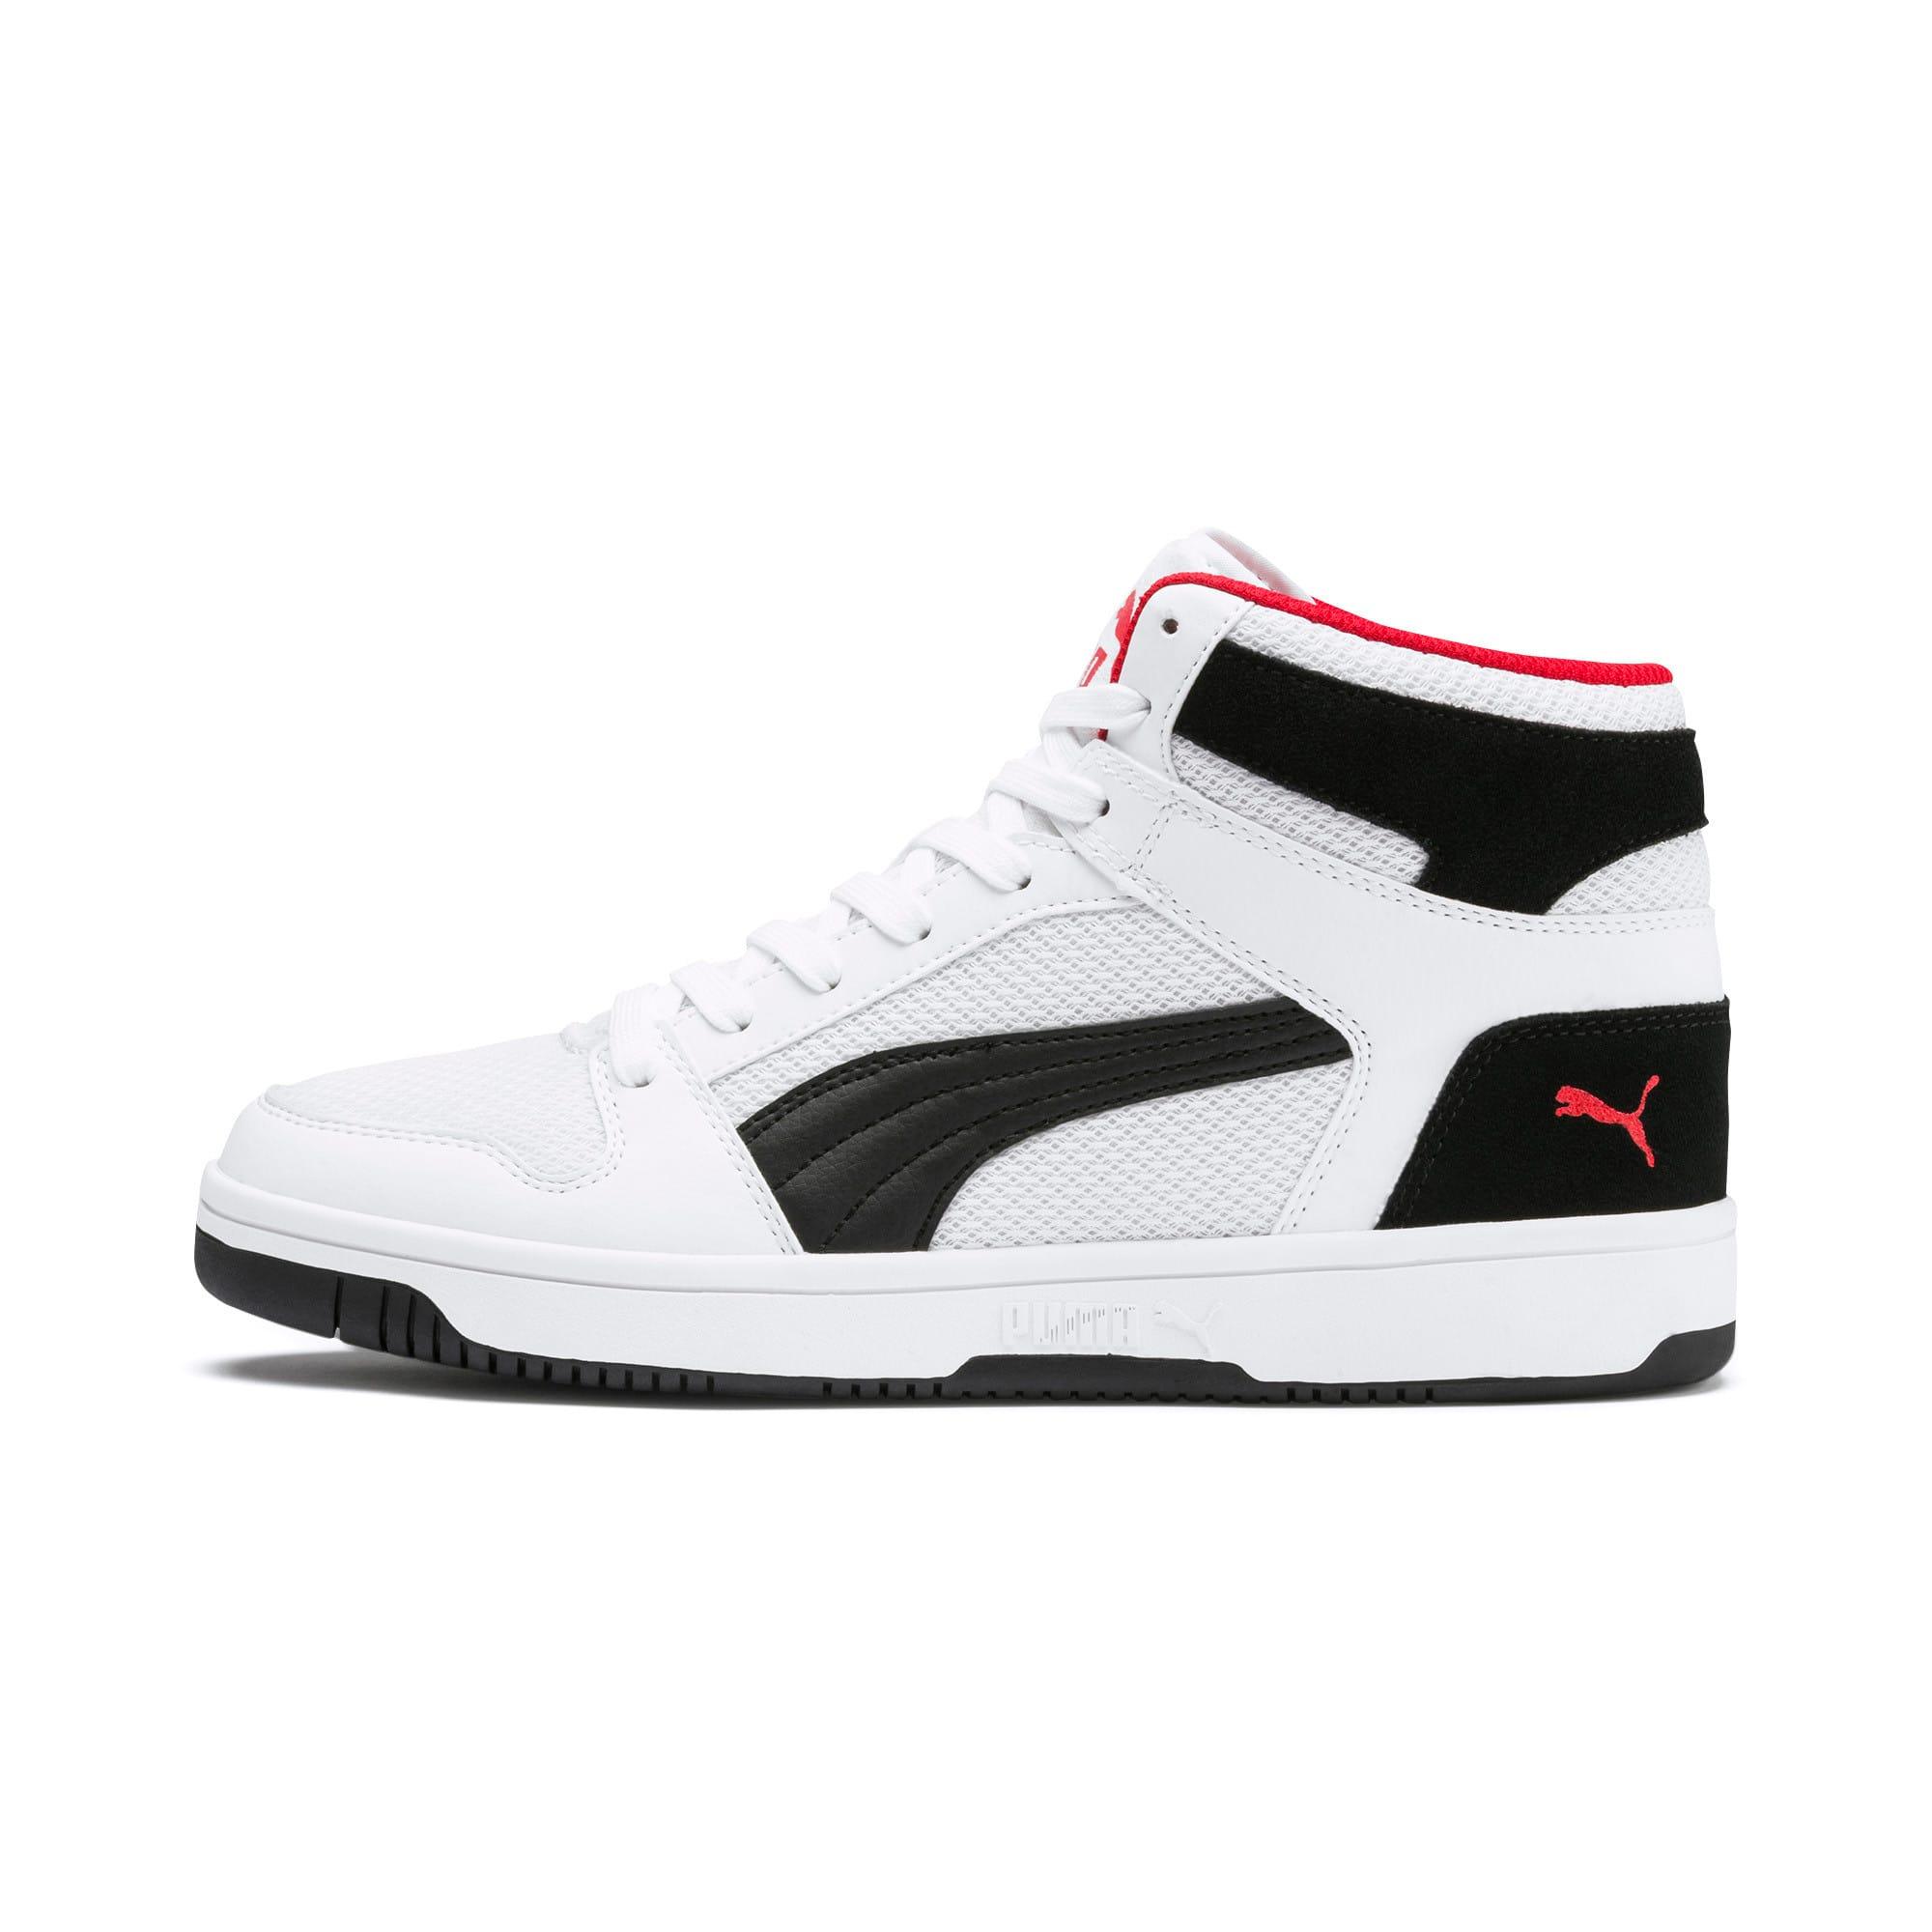 Thumbnail 1 of PUMA Rebound LayUp Mesh Sneakers, White-Black-High Risk Red, medium